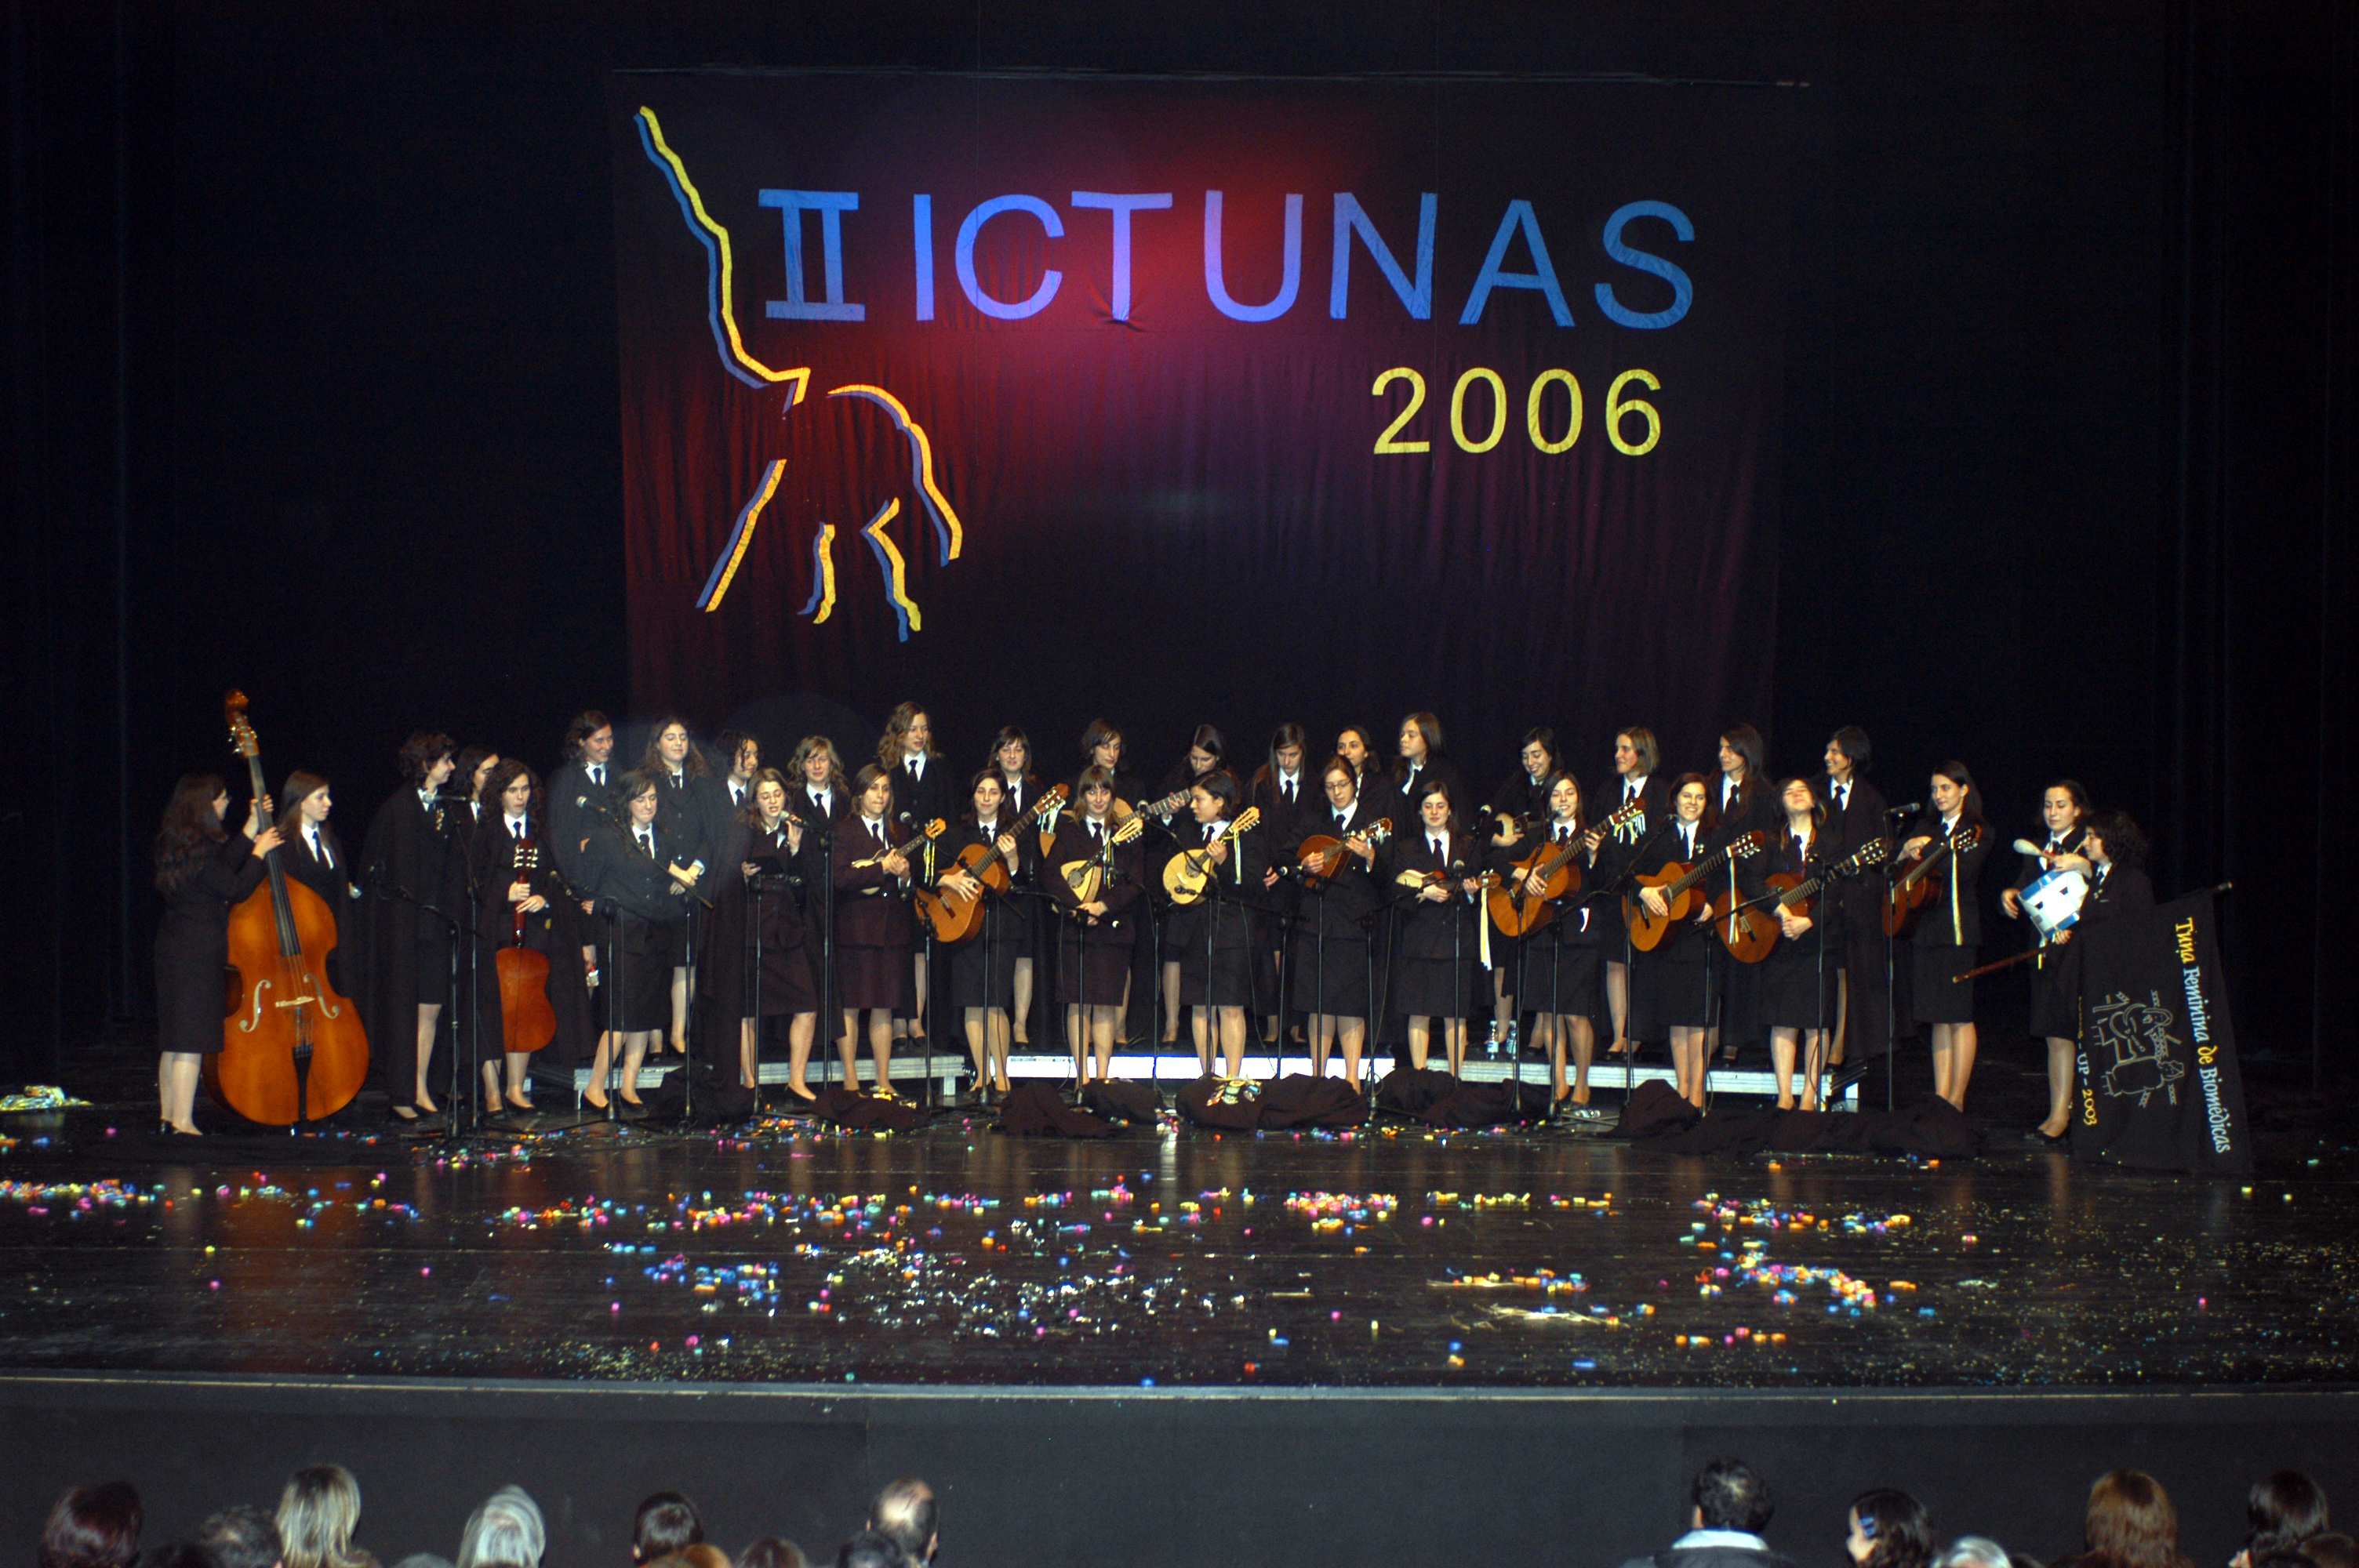 II ICTUNAS